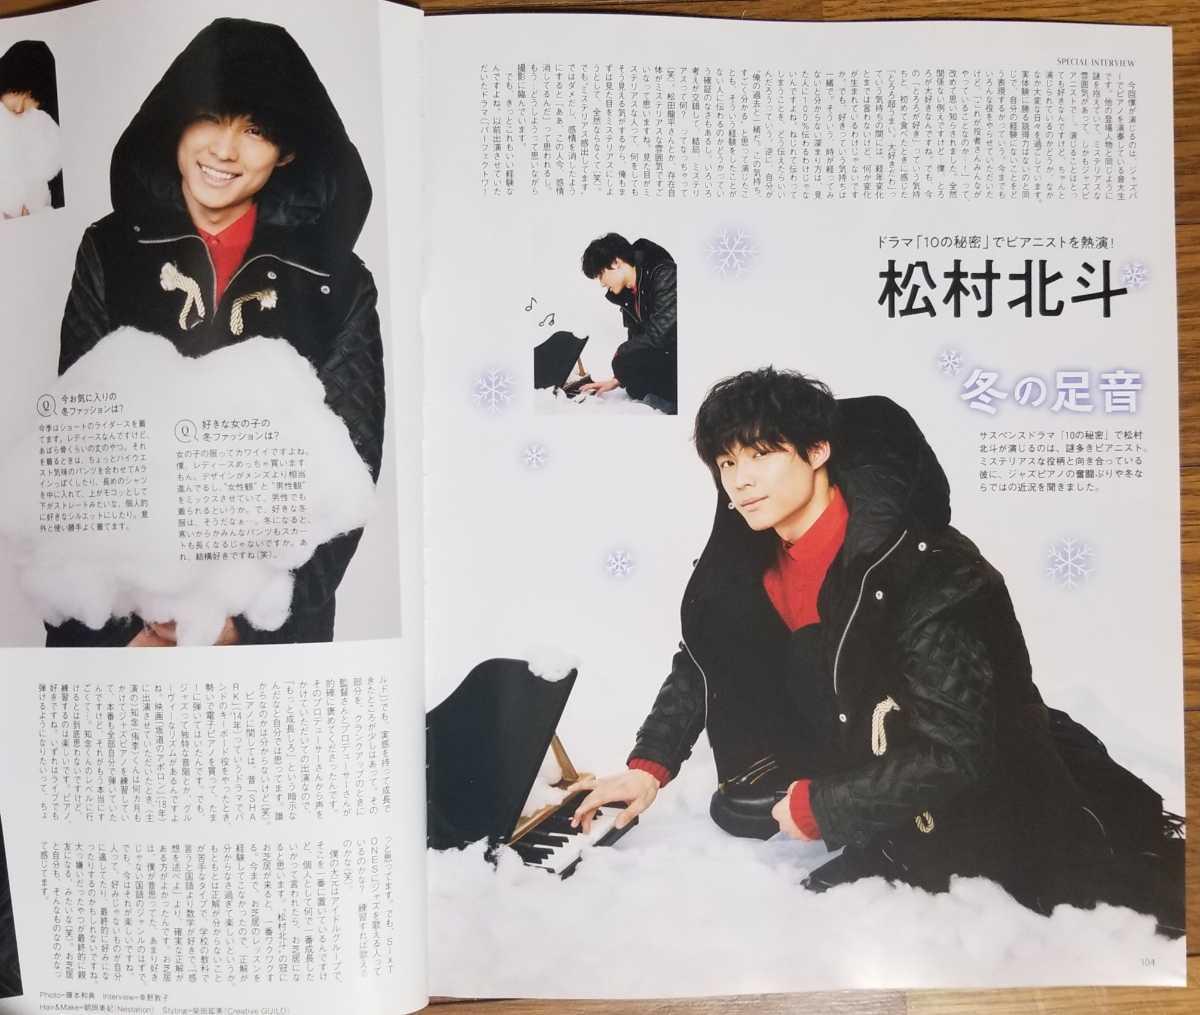 TVガイドplus vol.37 V6 NEWS 上田竜也 山下智久 King & Prince SixTONES Snow Man ジャニーズJr. 嵐 Hey!Say!JUMP Kis-My-Ft2 Sexy Zone